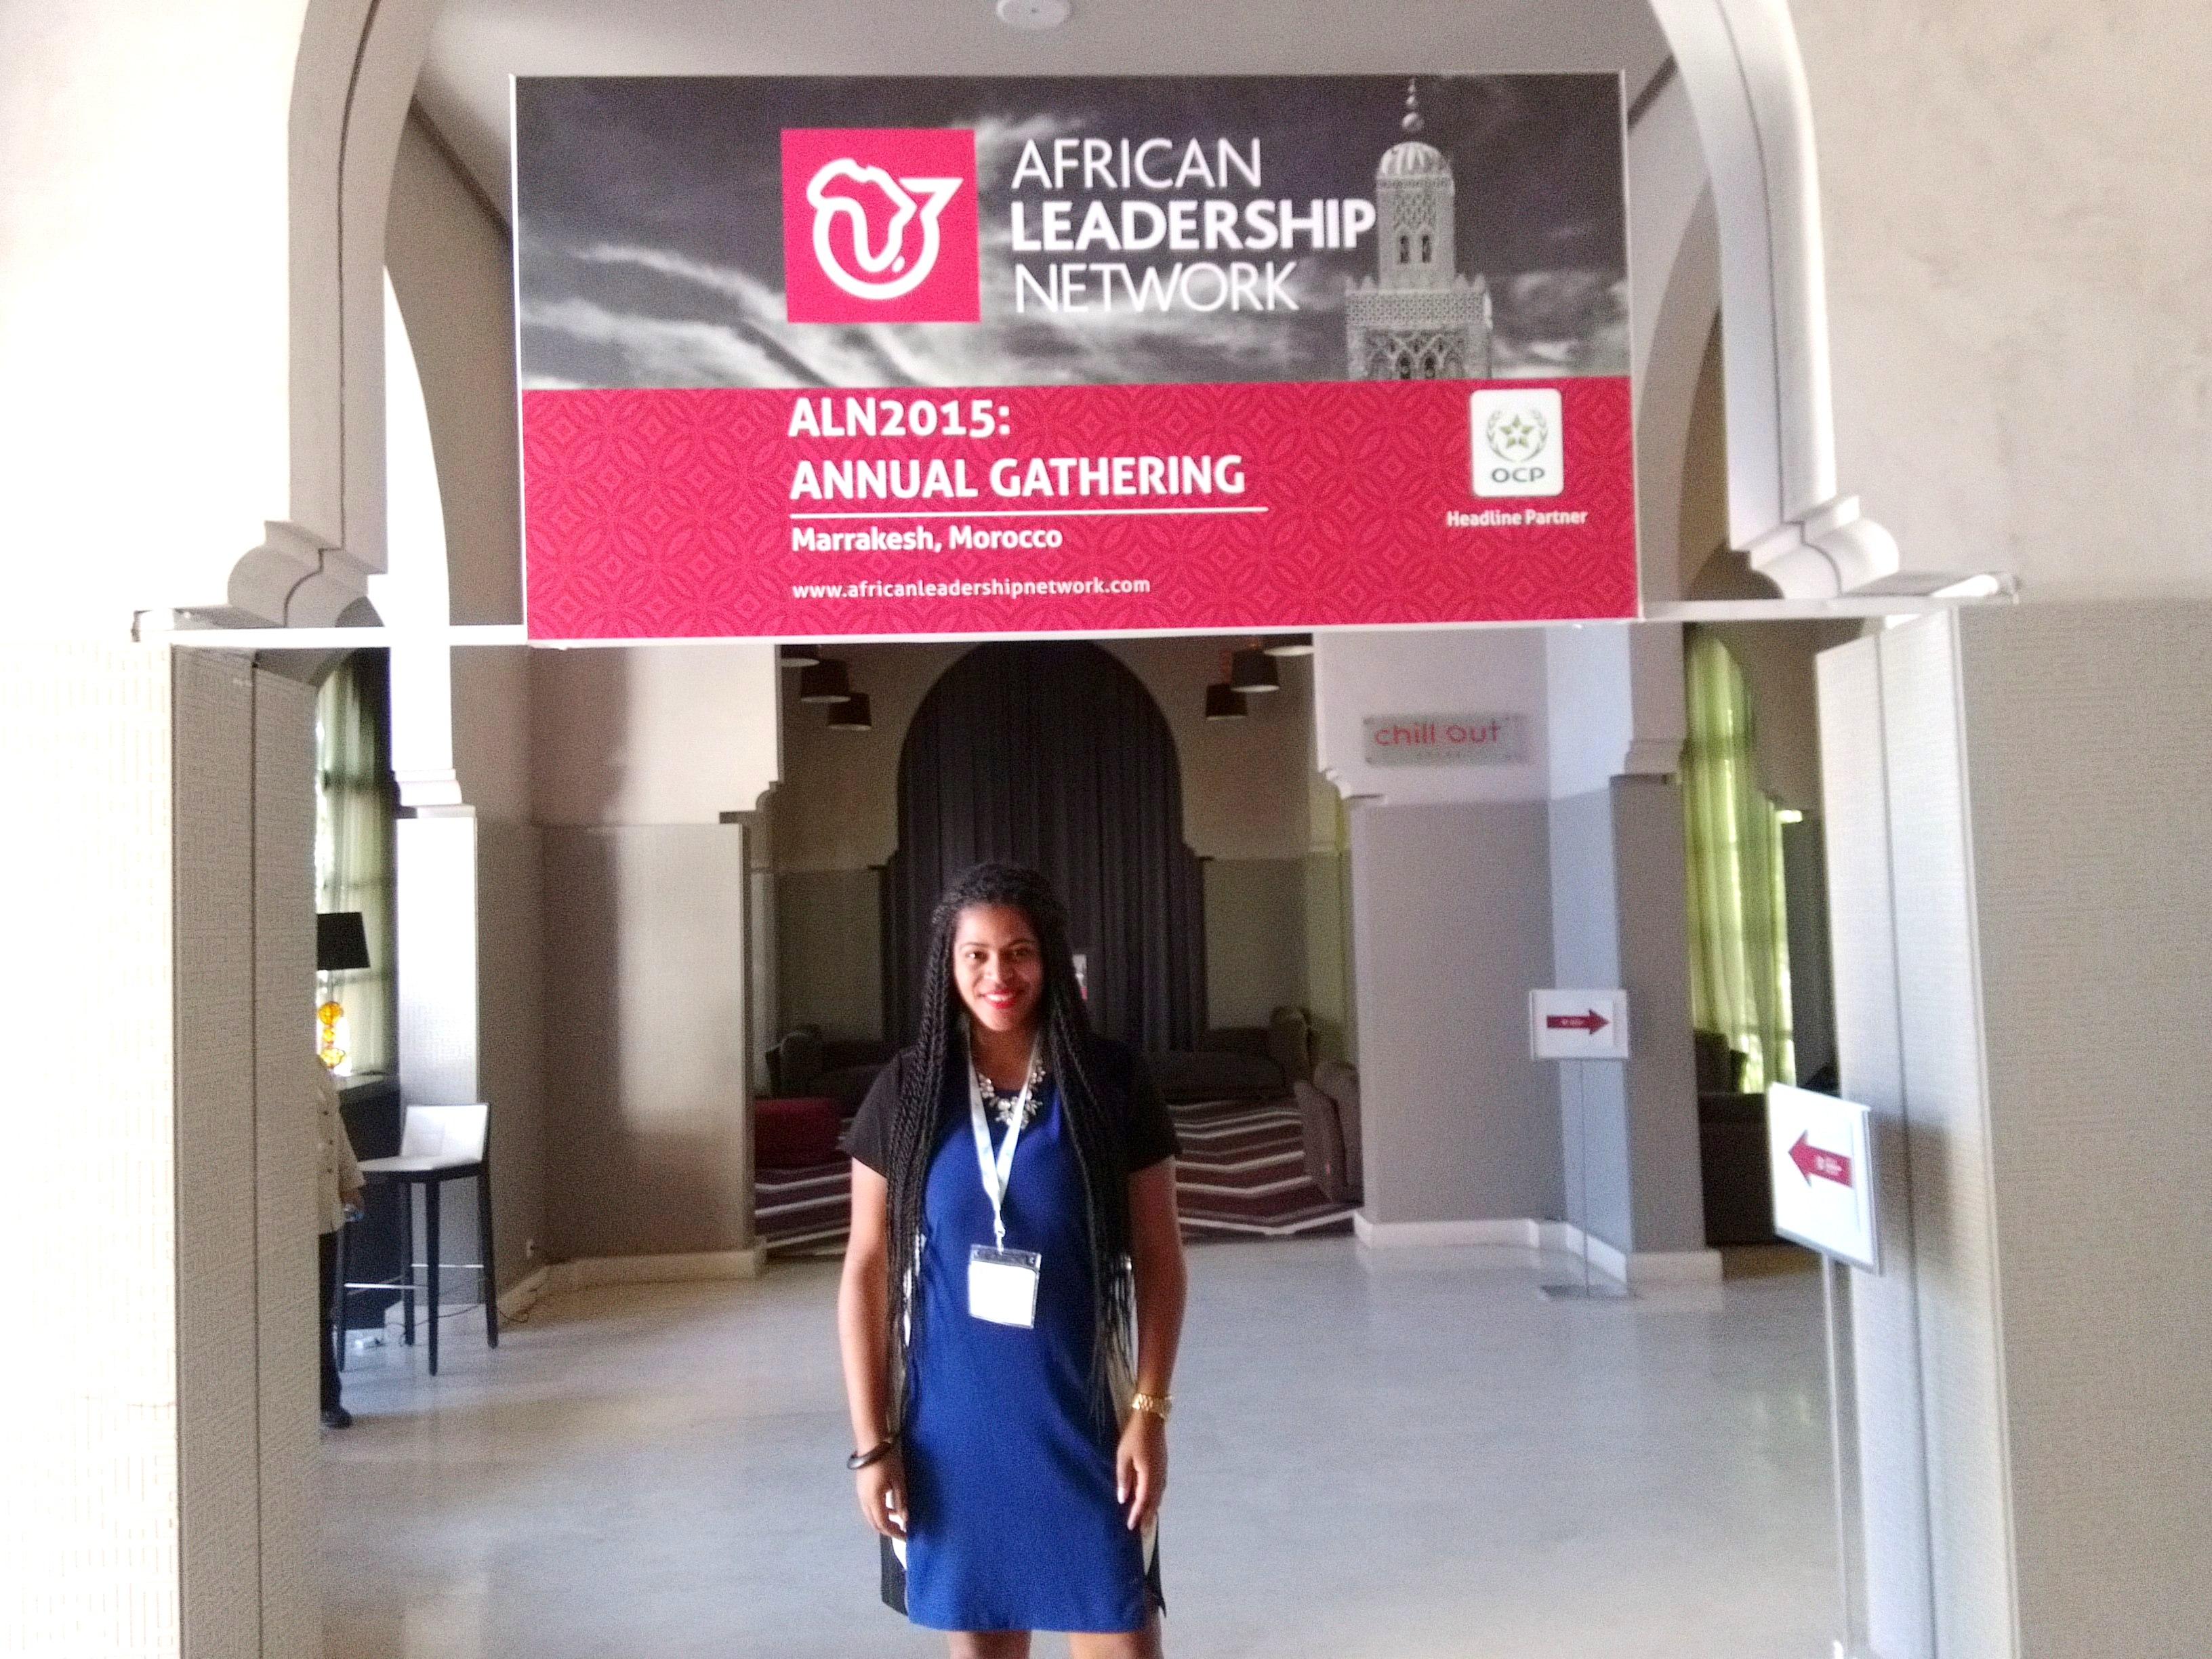 Cherae-robinson-taste-makers-africa-aln-ventures-innovation-tech-africa-African-Leadership-Network